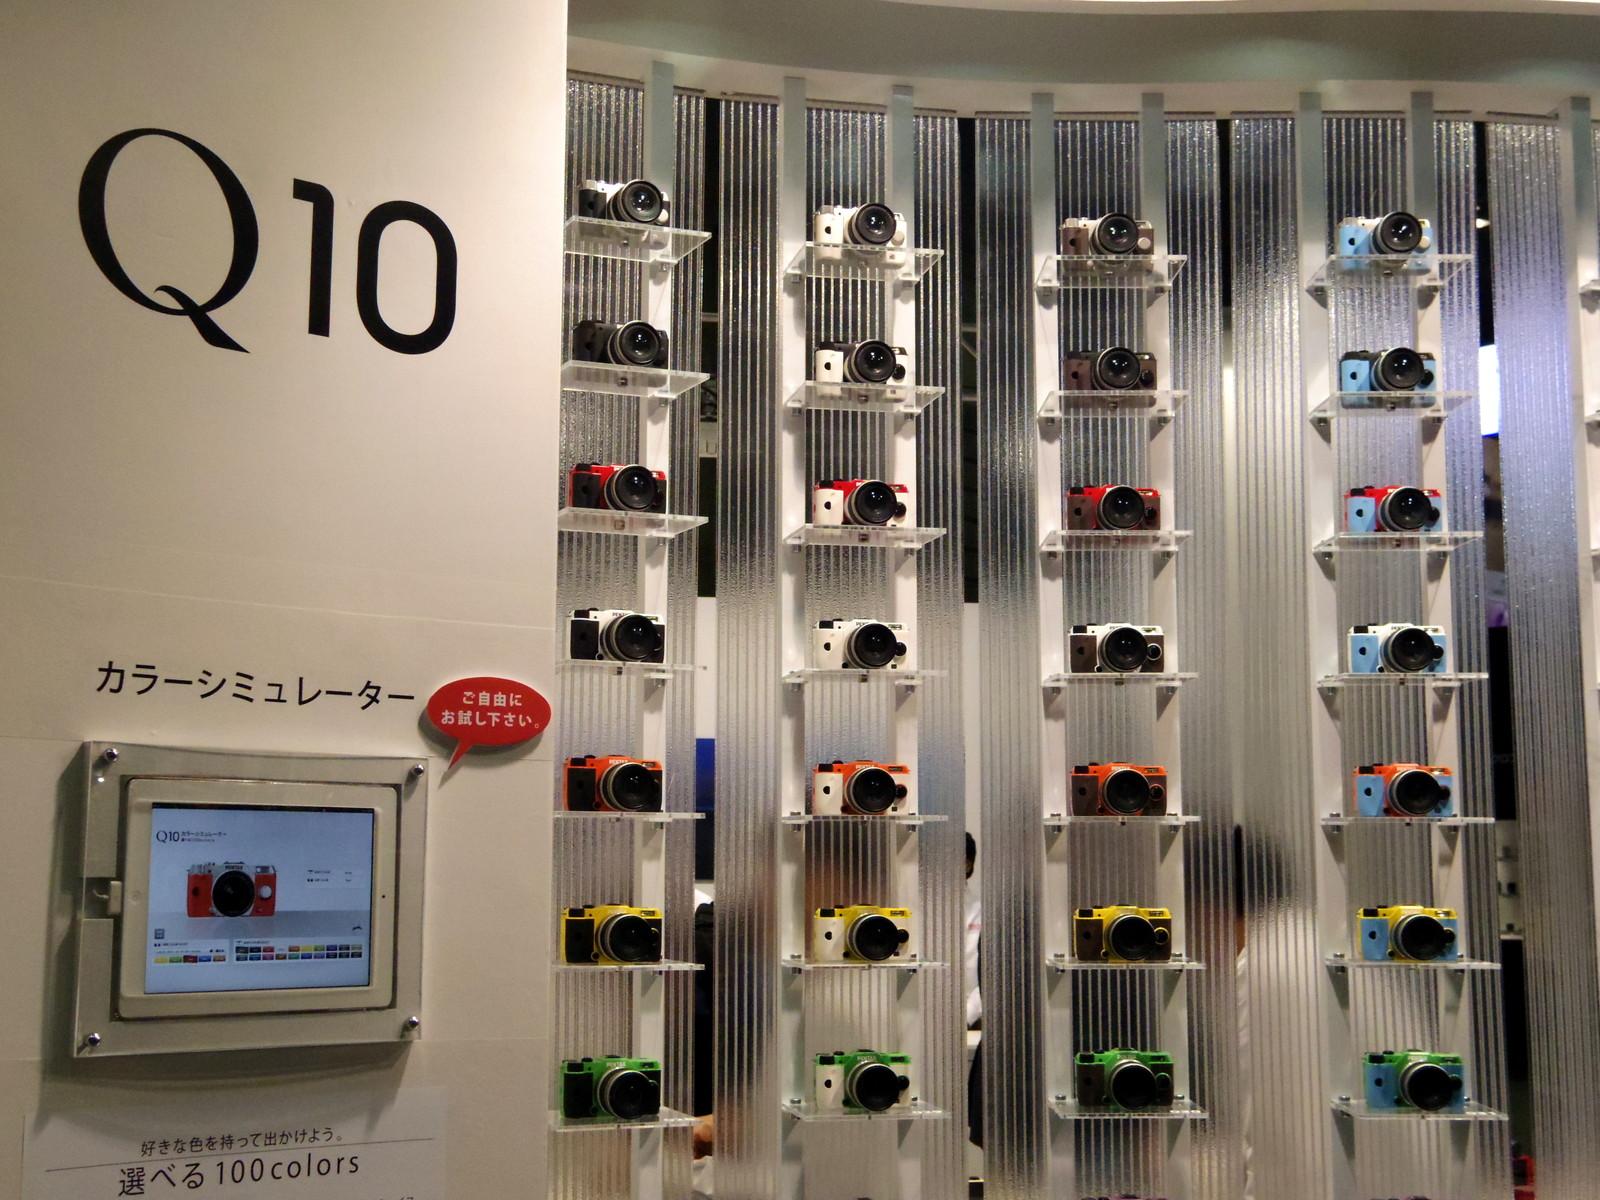 Q10_100